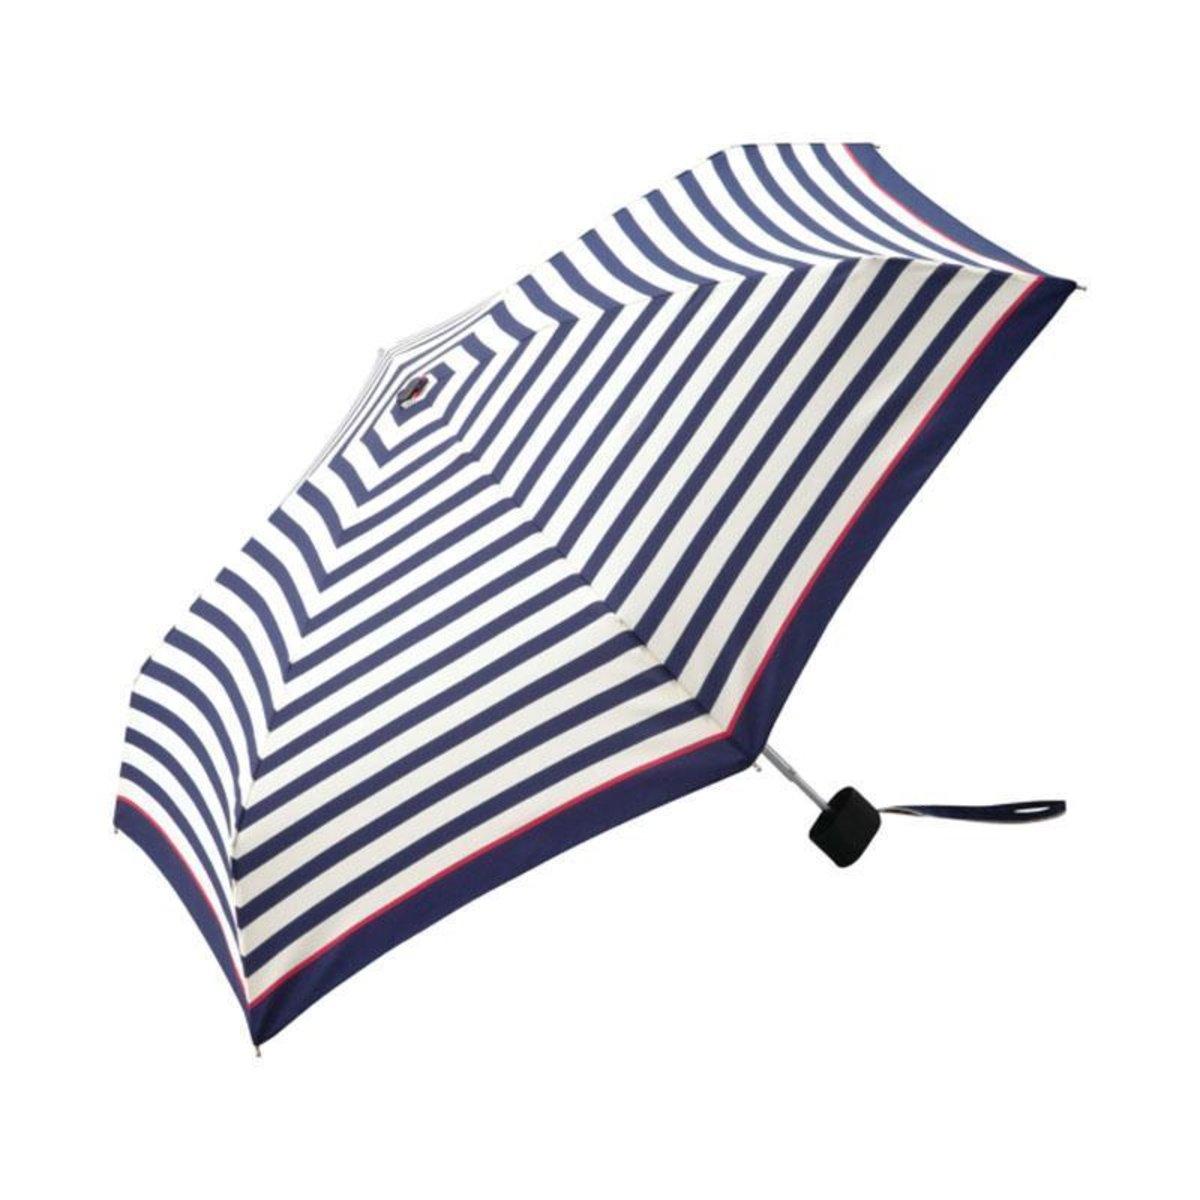 KiU Tiny 迷你縮骨遮 防UV雨傘 日本品牌 - 藍白條紋 Line Border